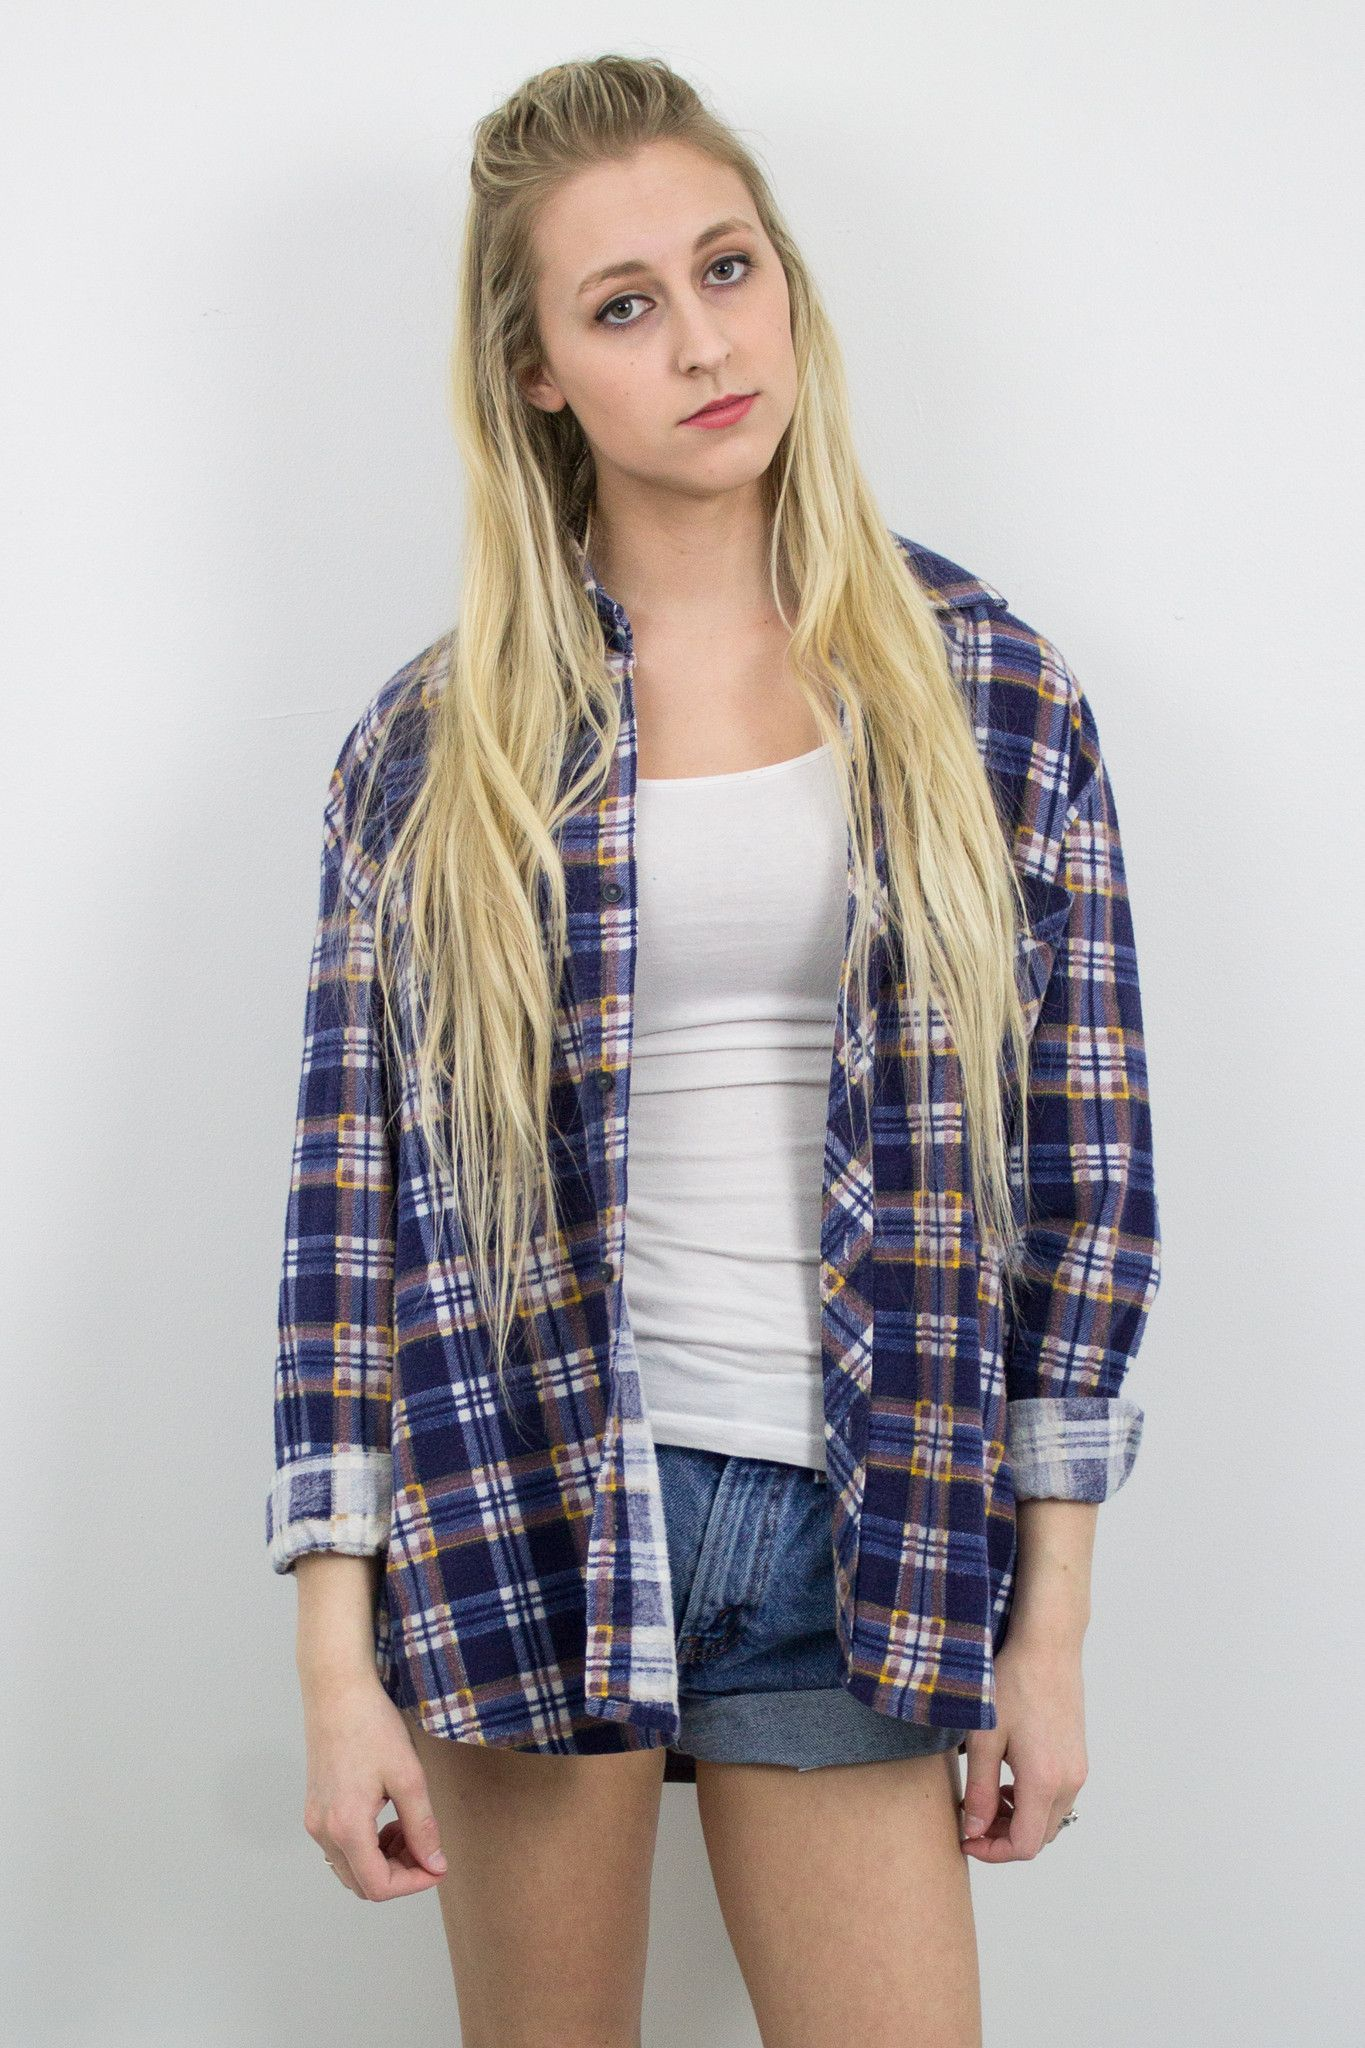 Flannel shirts 1990s  Vintage Plaid Grunge Flannel  Products  Pinterest  Flannels